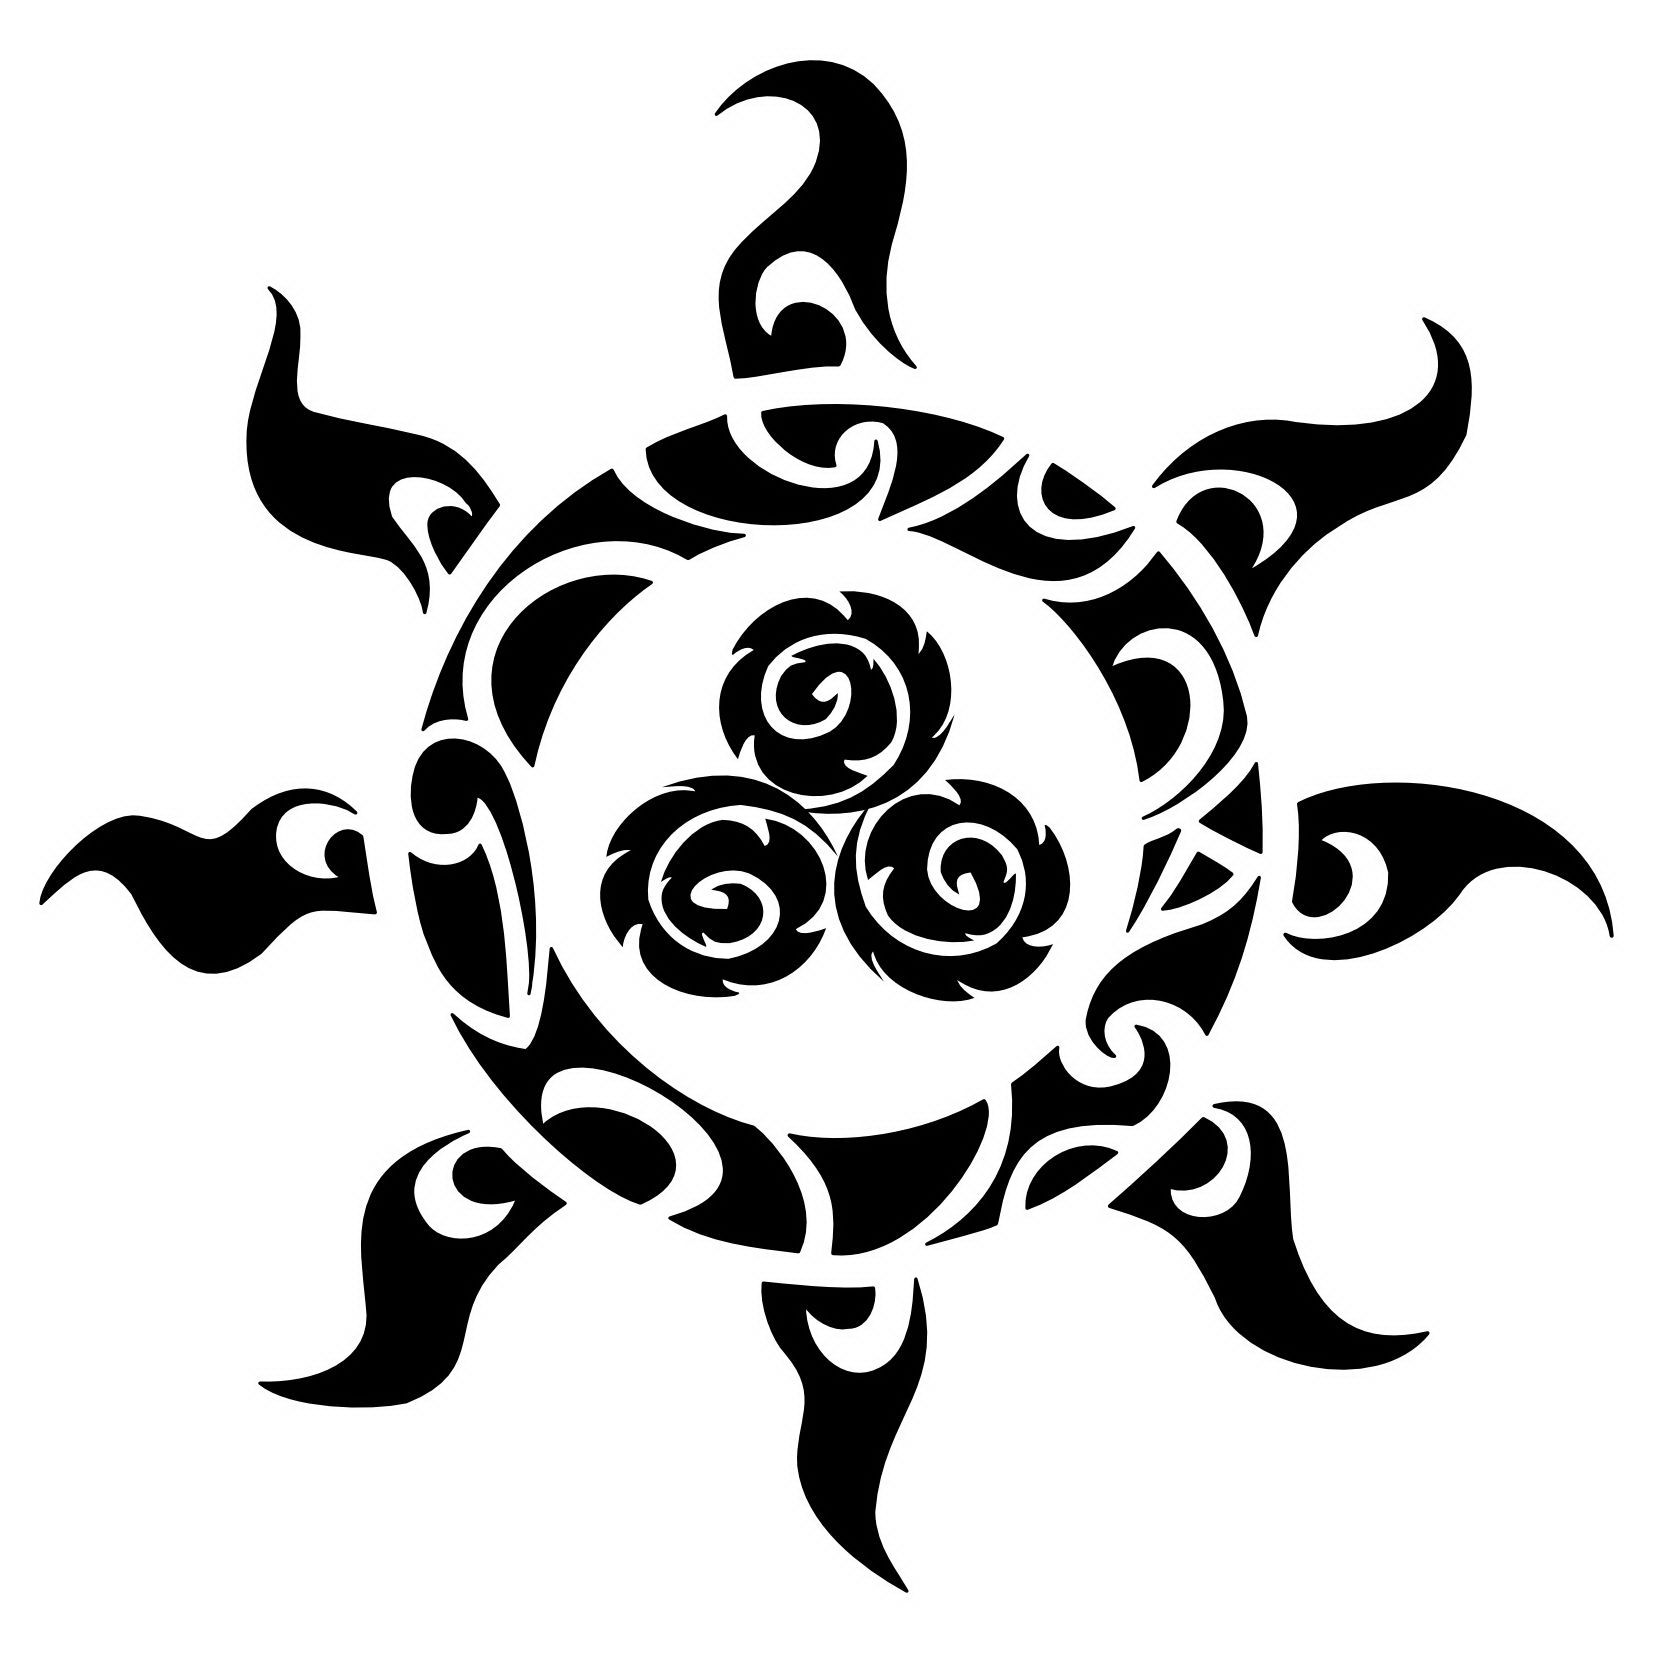 1000 Ideas About Sun Tattoo Meaning On Pinterest: Polynesian Tattoo Meanings Sun Design